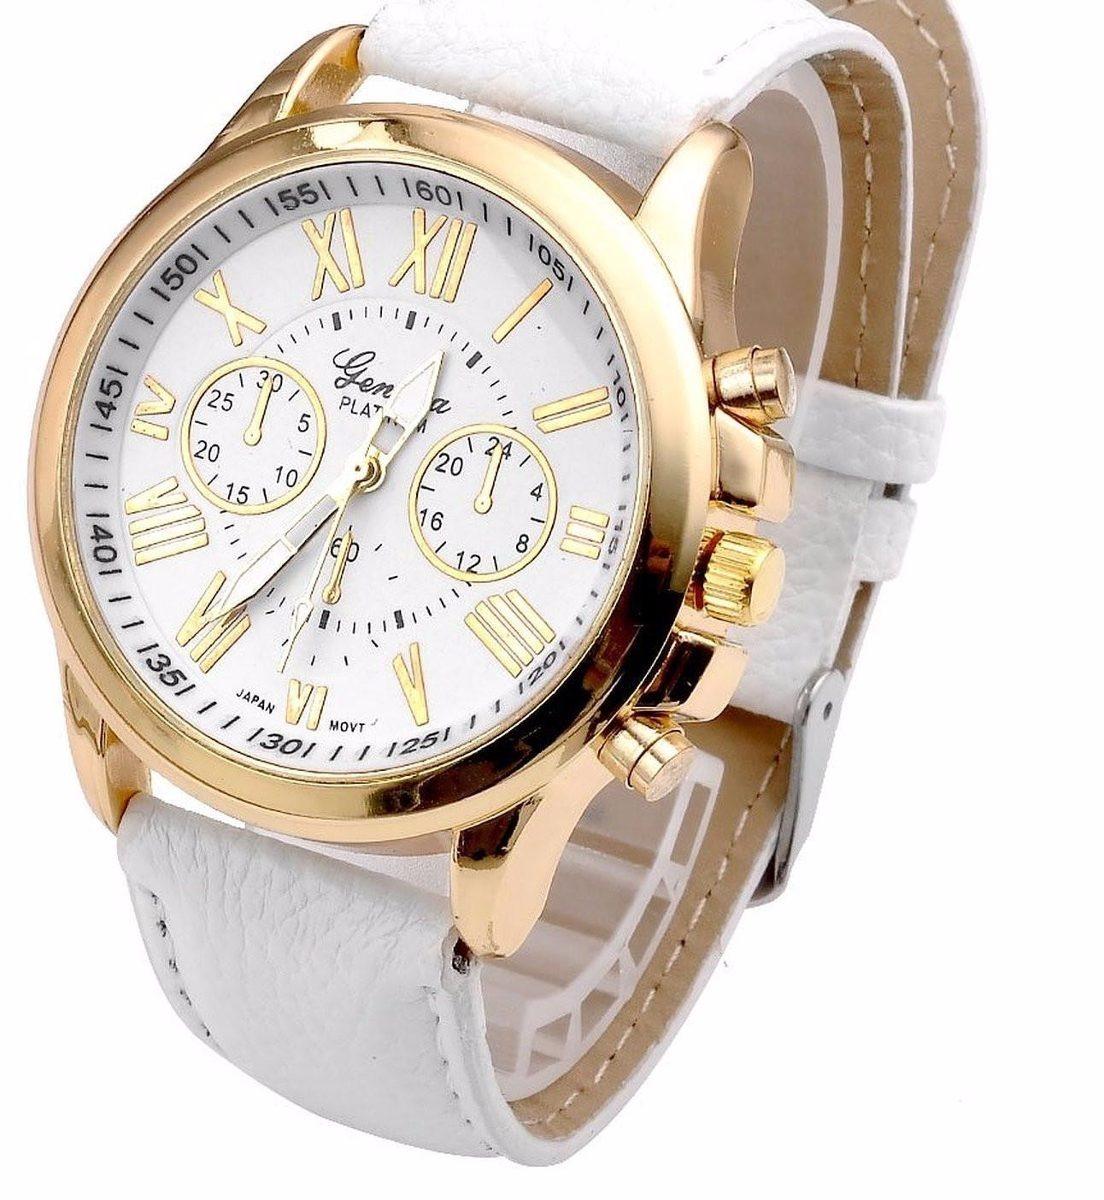 b59ce4b5fc8 relógio feminino pulseira couro moda geneva dourado. Carregando zoom.